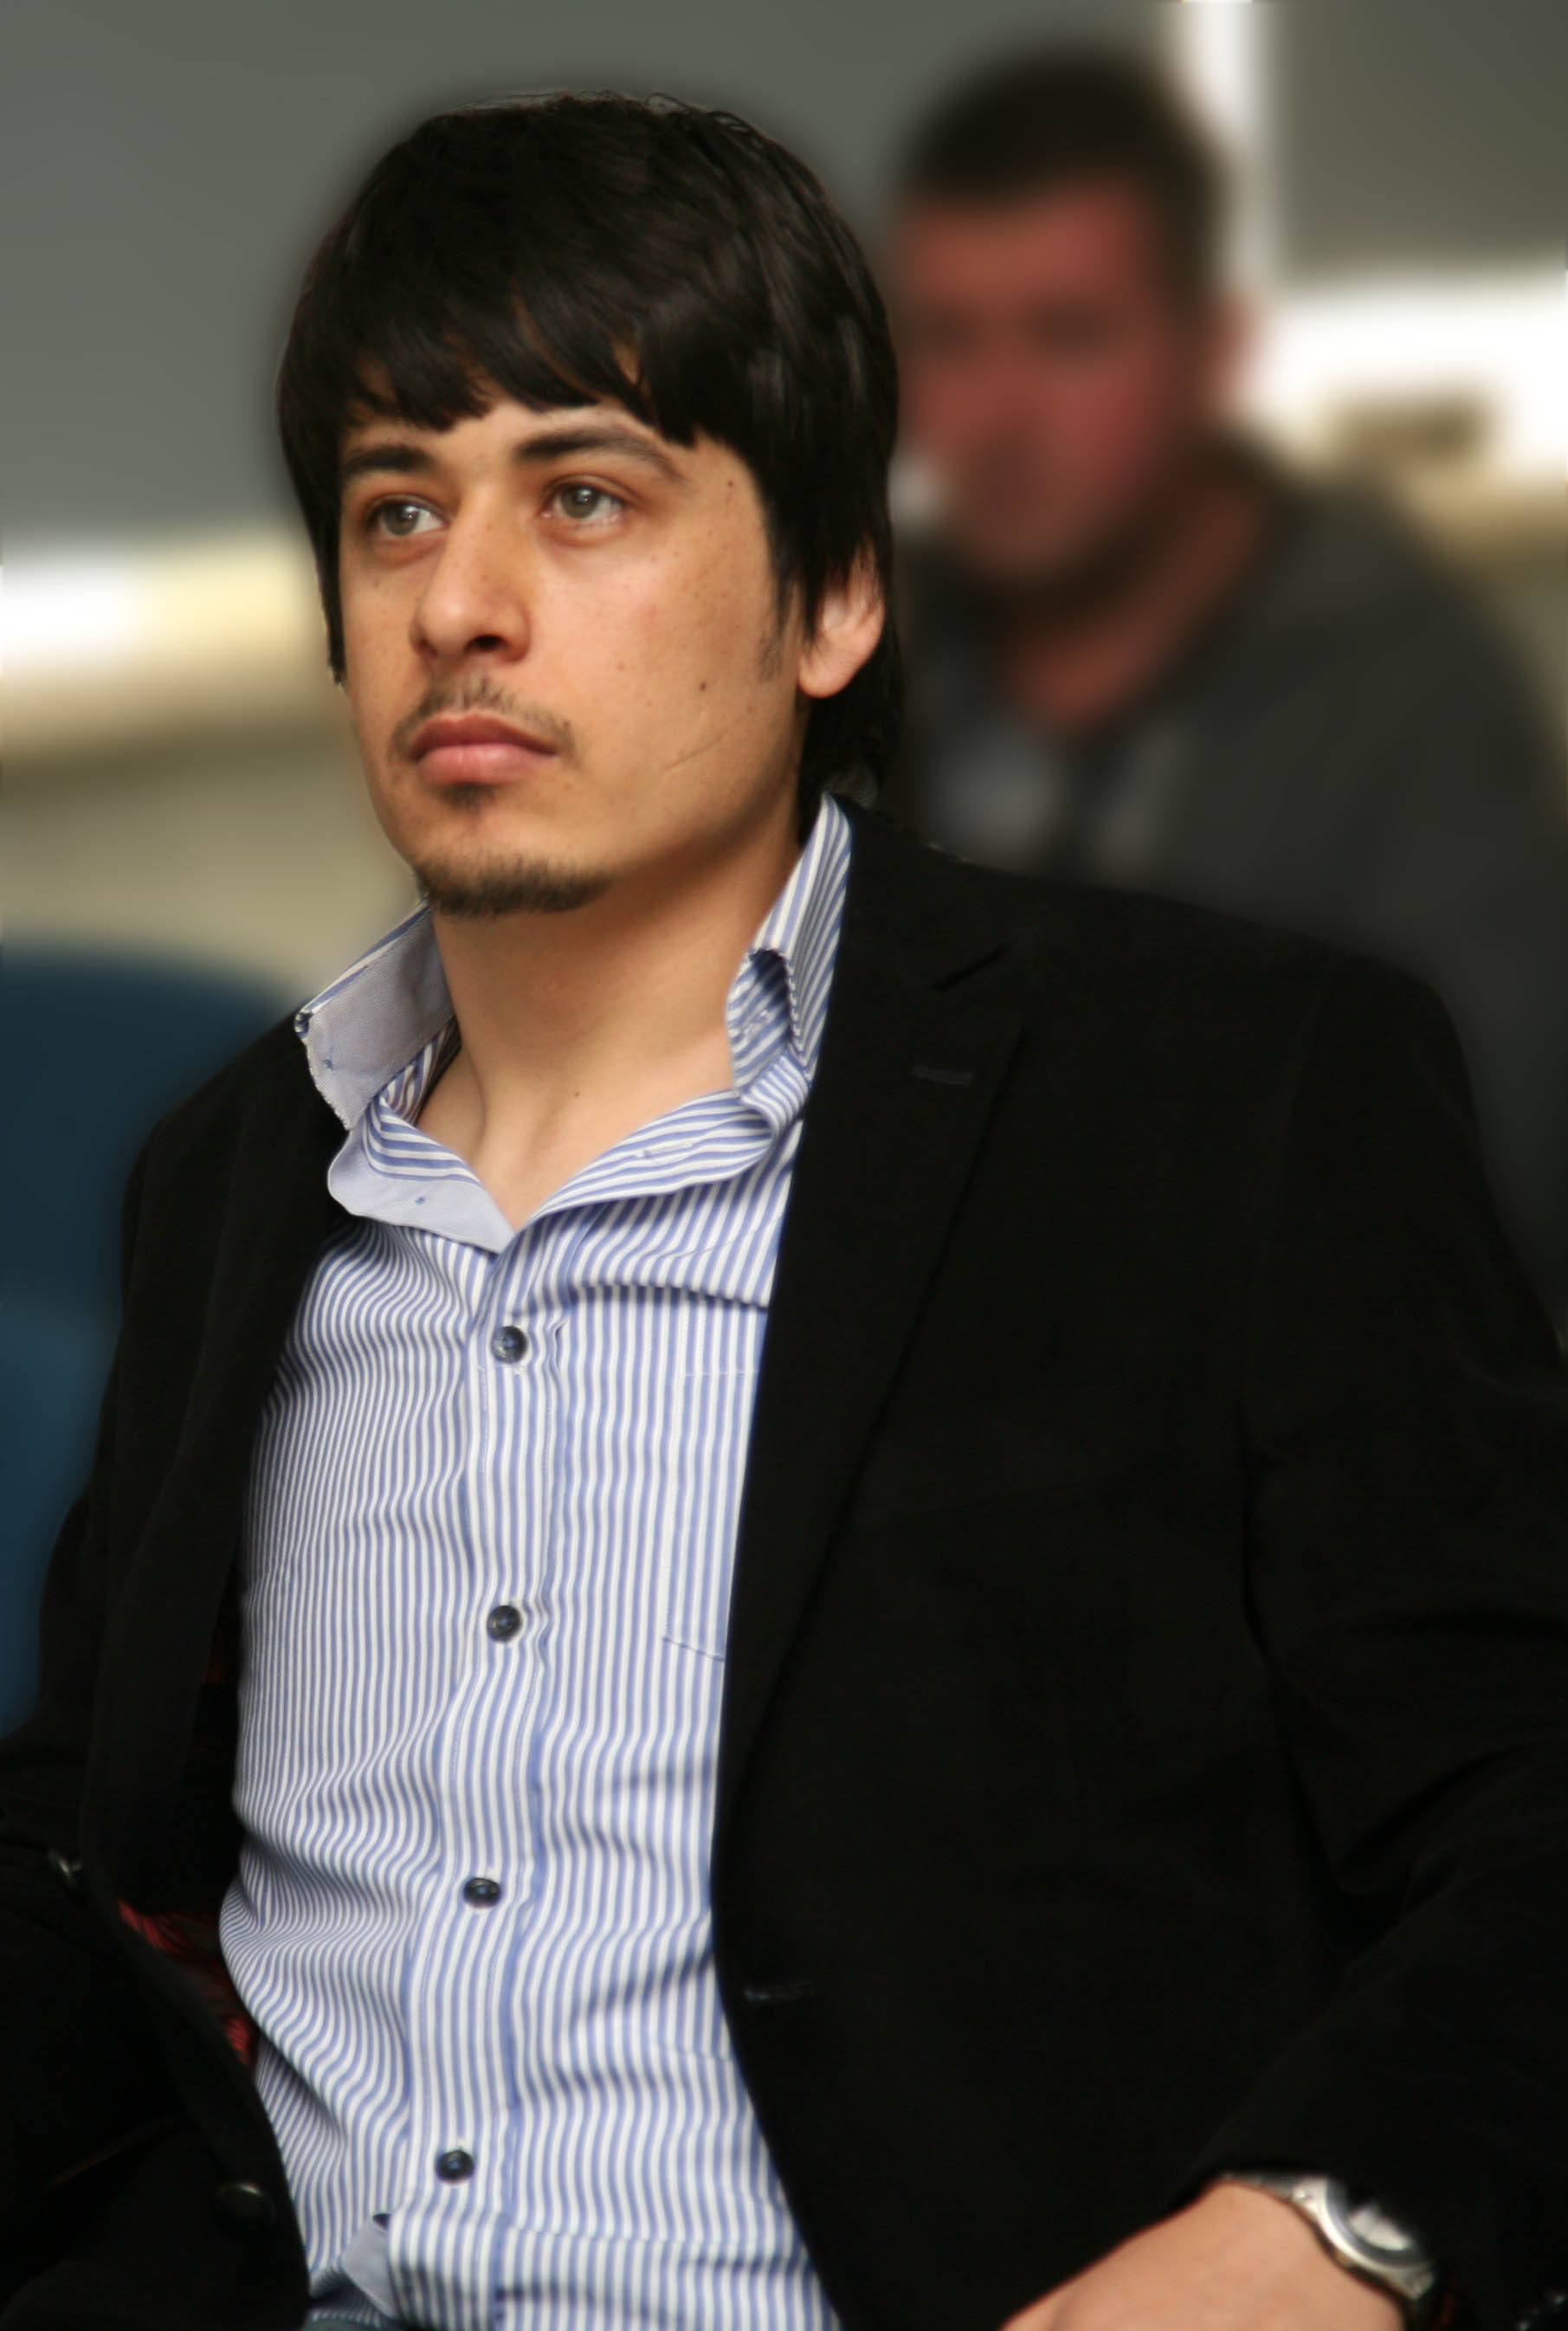 249-Alzheımer-Mustafa Tat